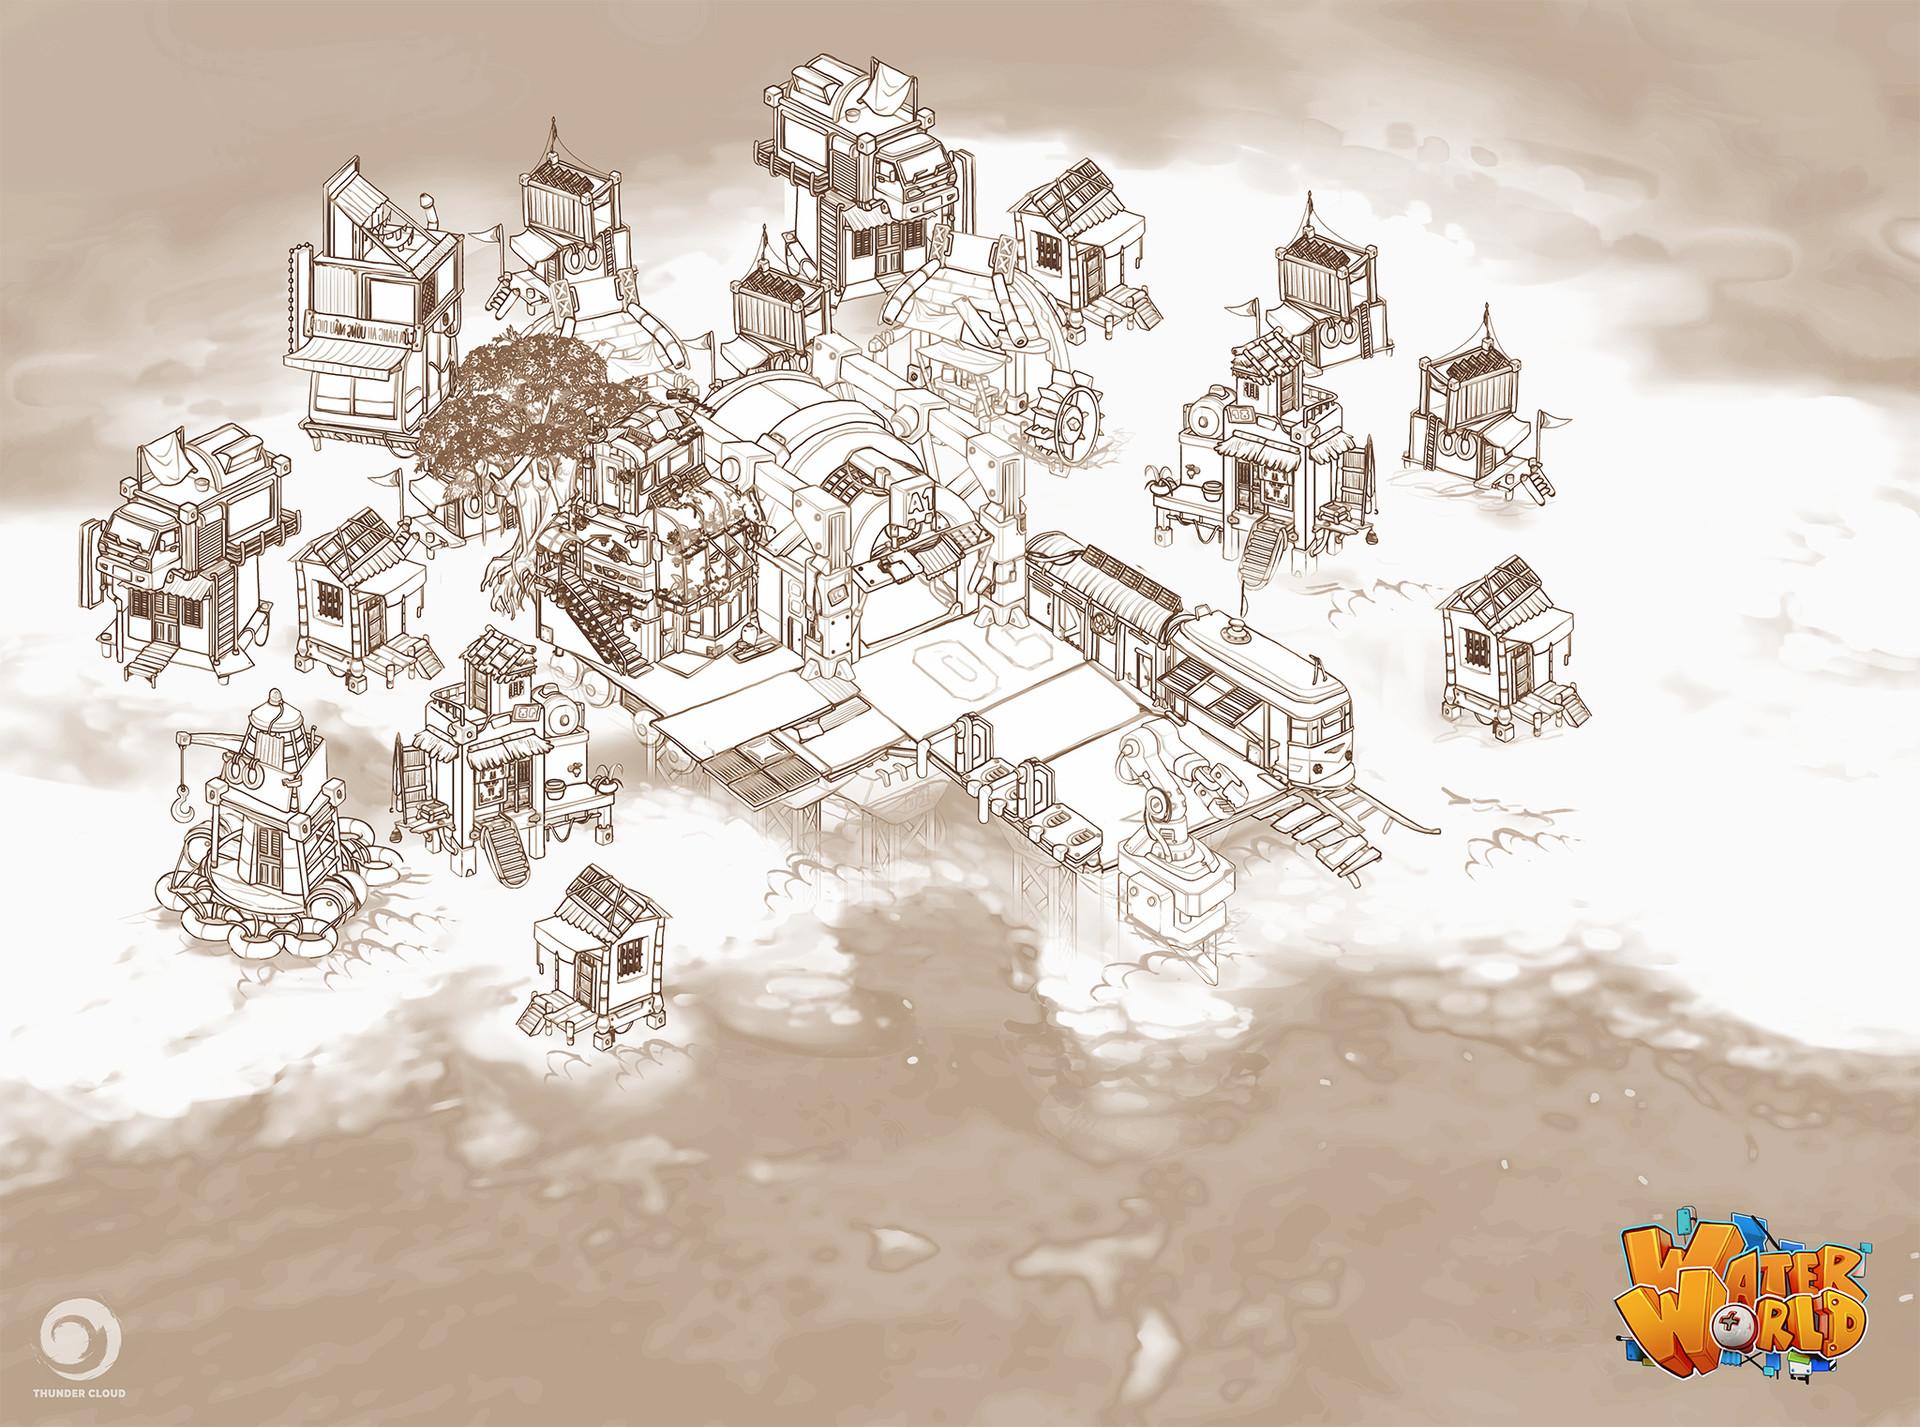 Thunder cloud floatingtown s1concept v006 sketches